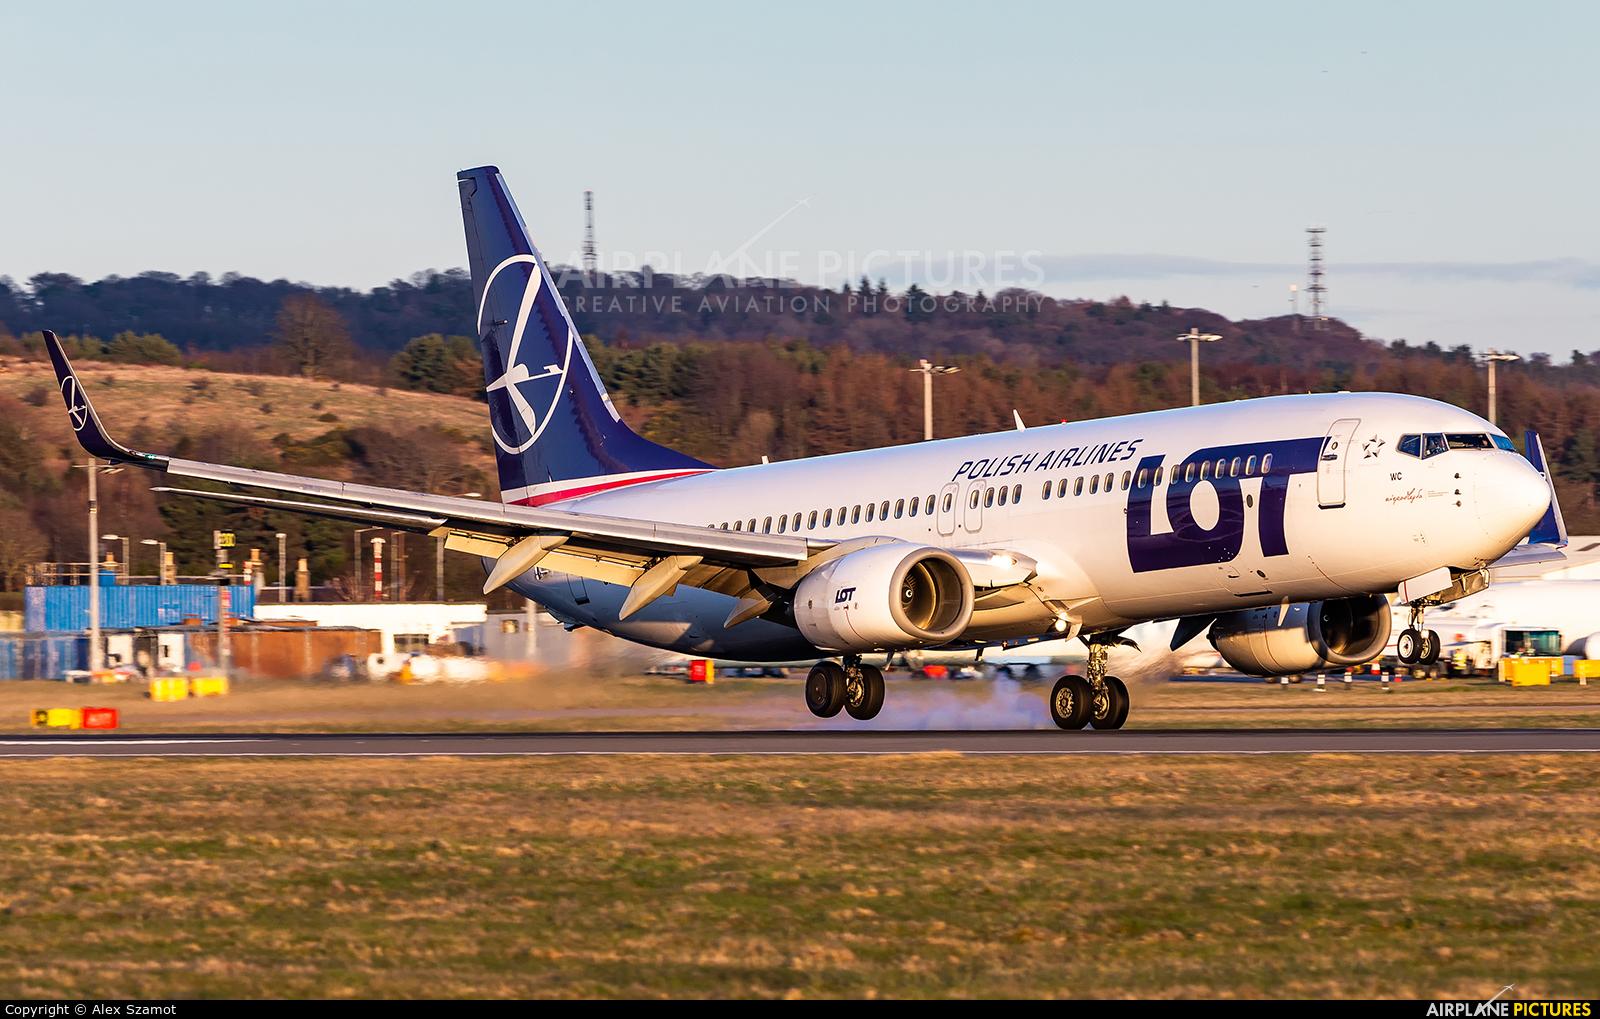 LOT - Polish Airlines SP-LWC aircraft at Edinburgh